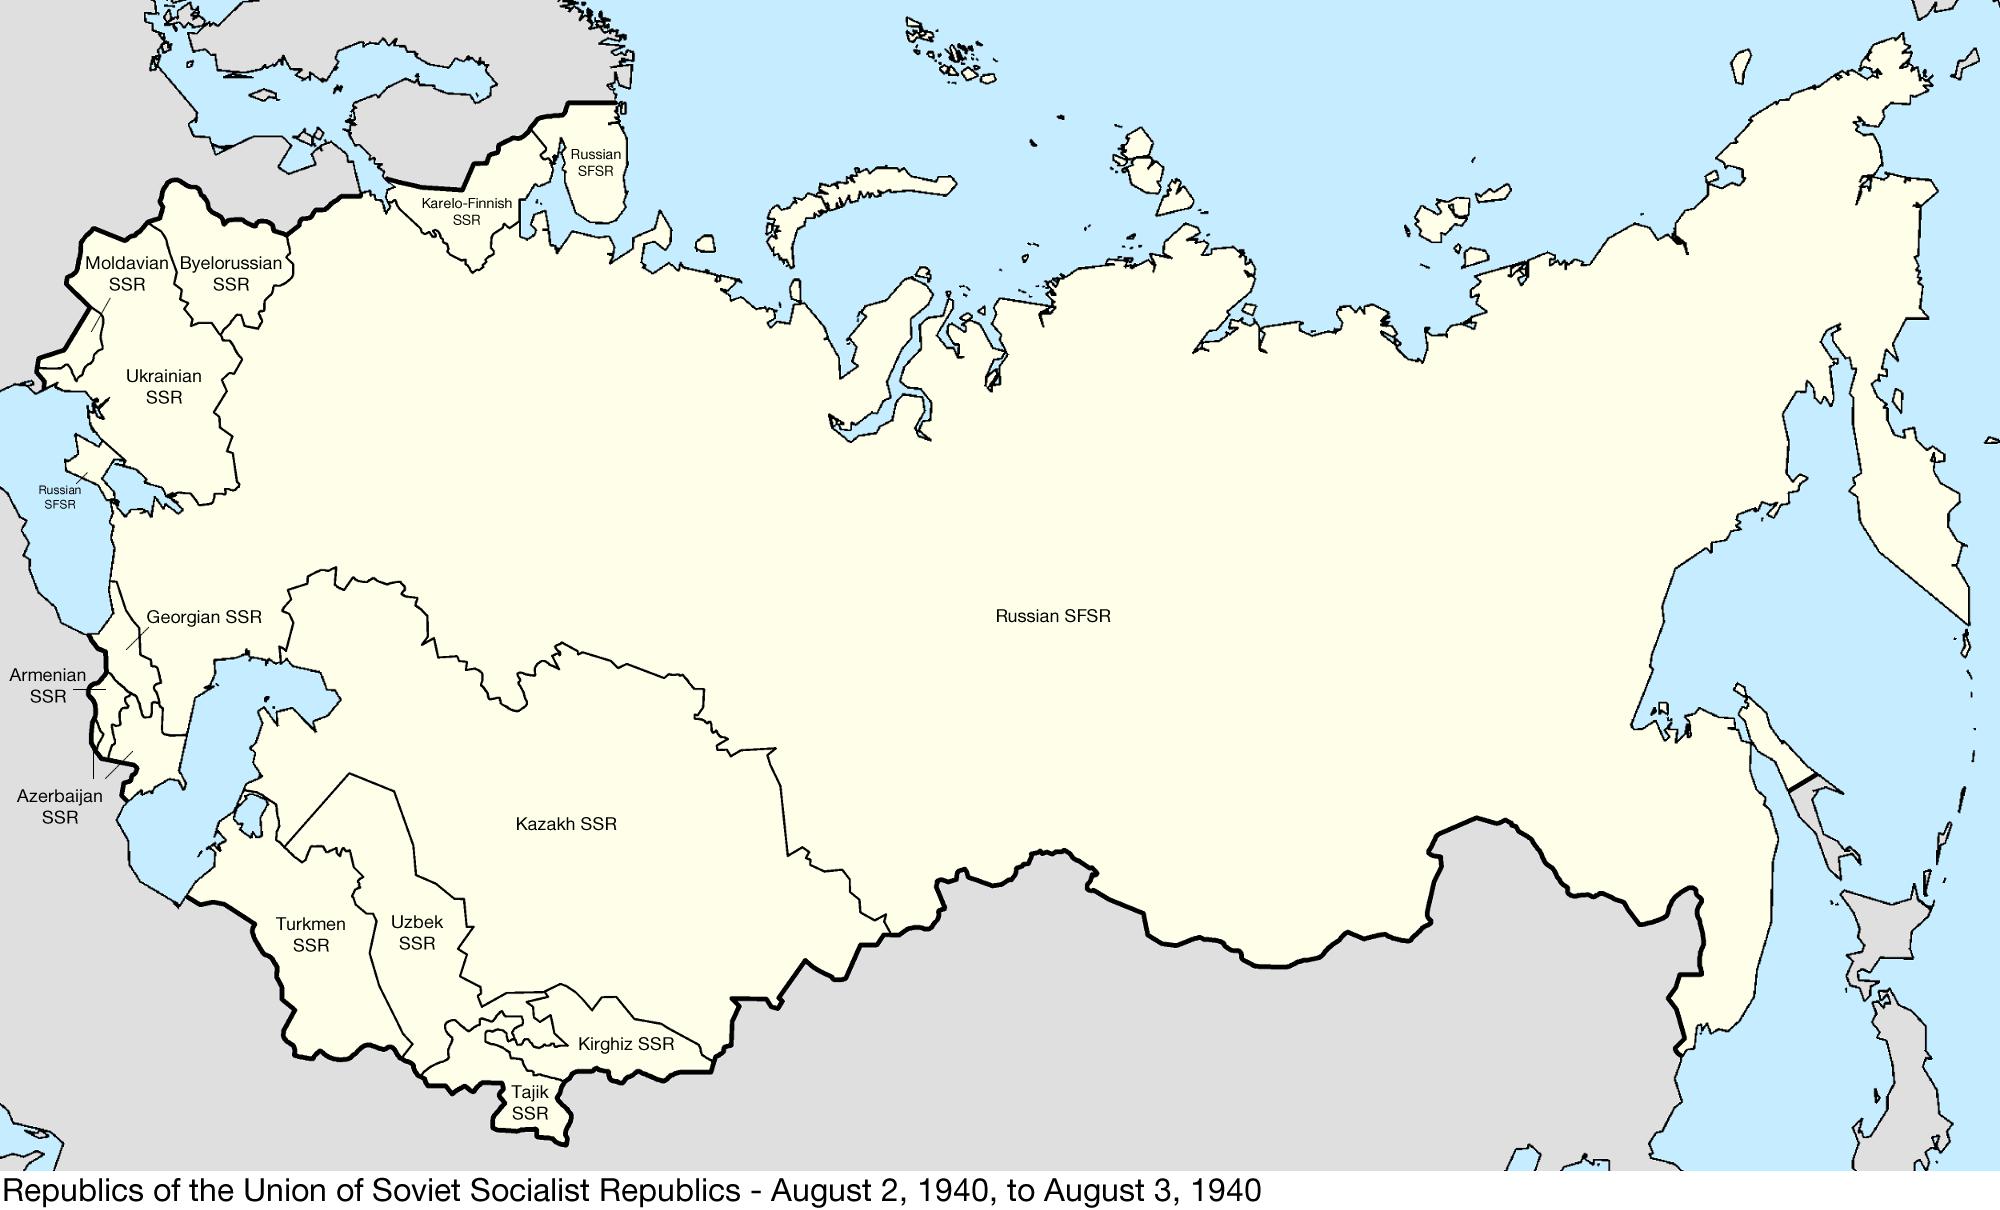 Filesoviet union map 1940 08 02 to 1940 08 03g wikimedia commons filesoviet union map 1940 08 02 to 1940 08 03 gumiabroncs Gallery